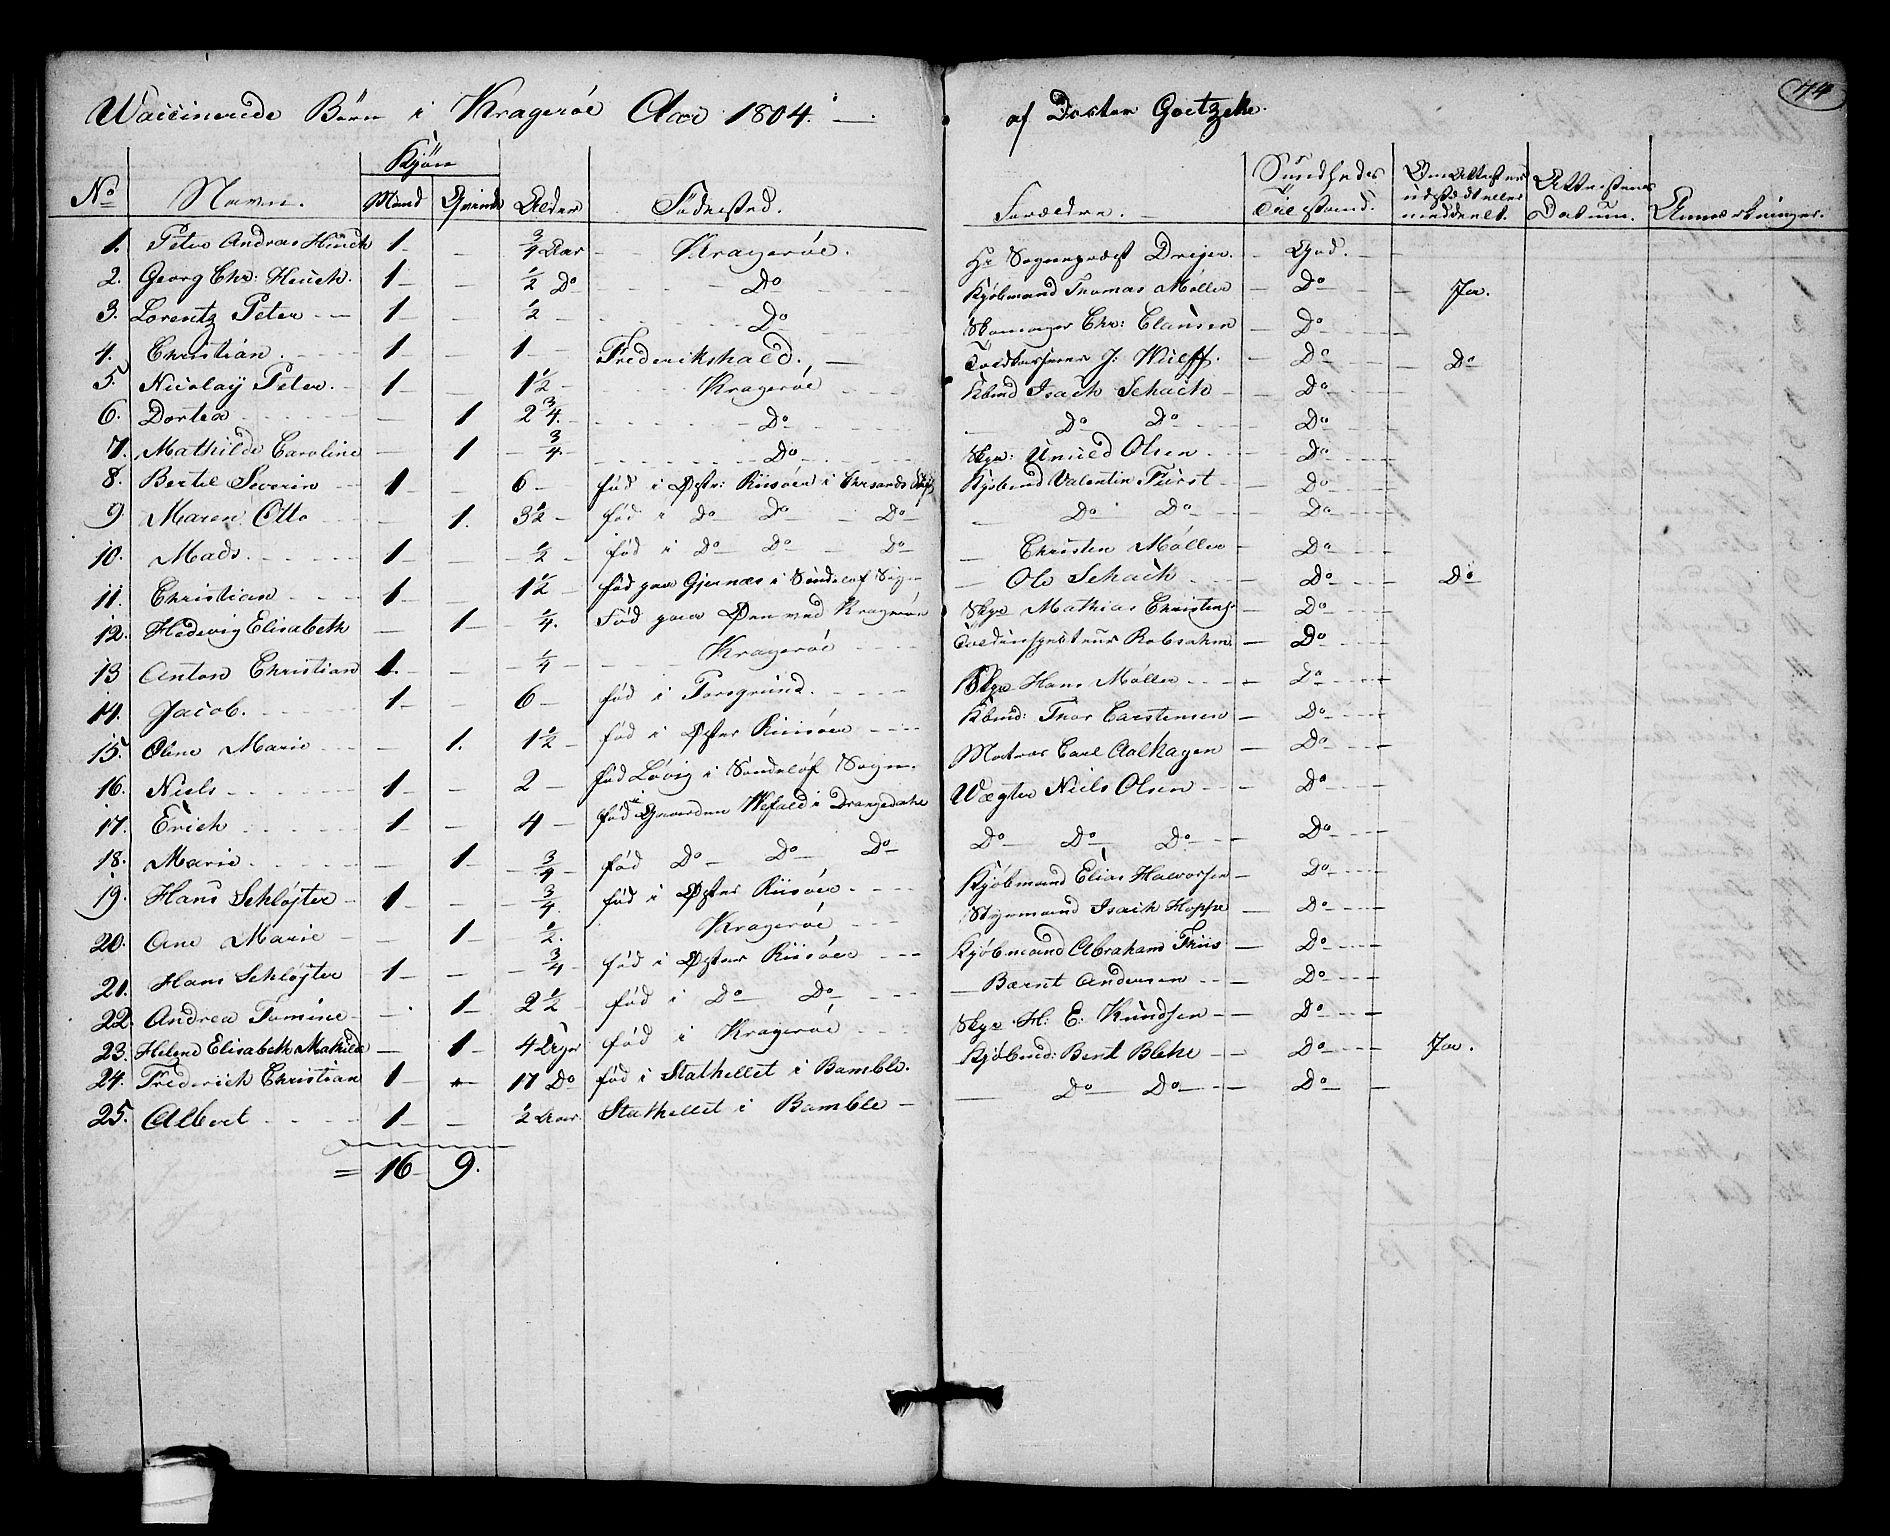 SAKO, Kragerø kirkebøker, F/Fa/L0003: Ministerialbok nr. 3, 1802-1813, s. 74